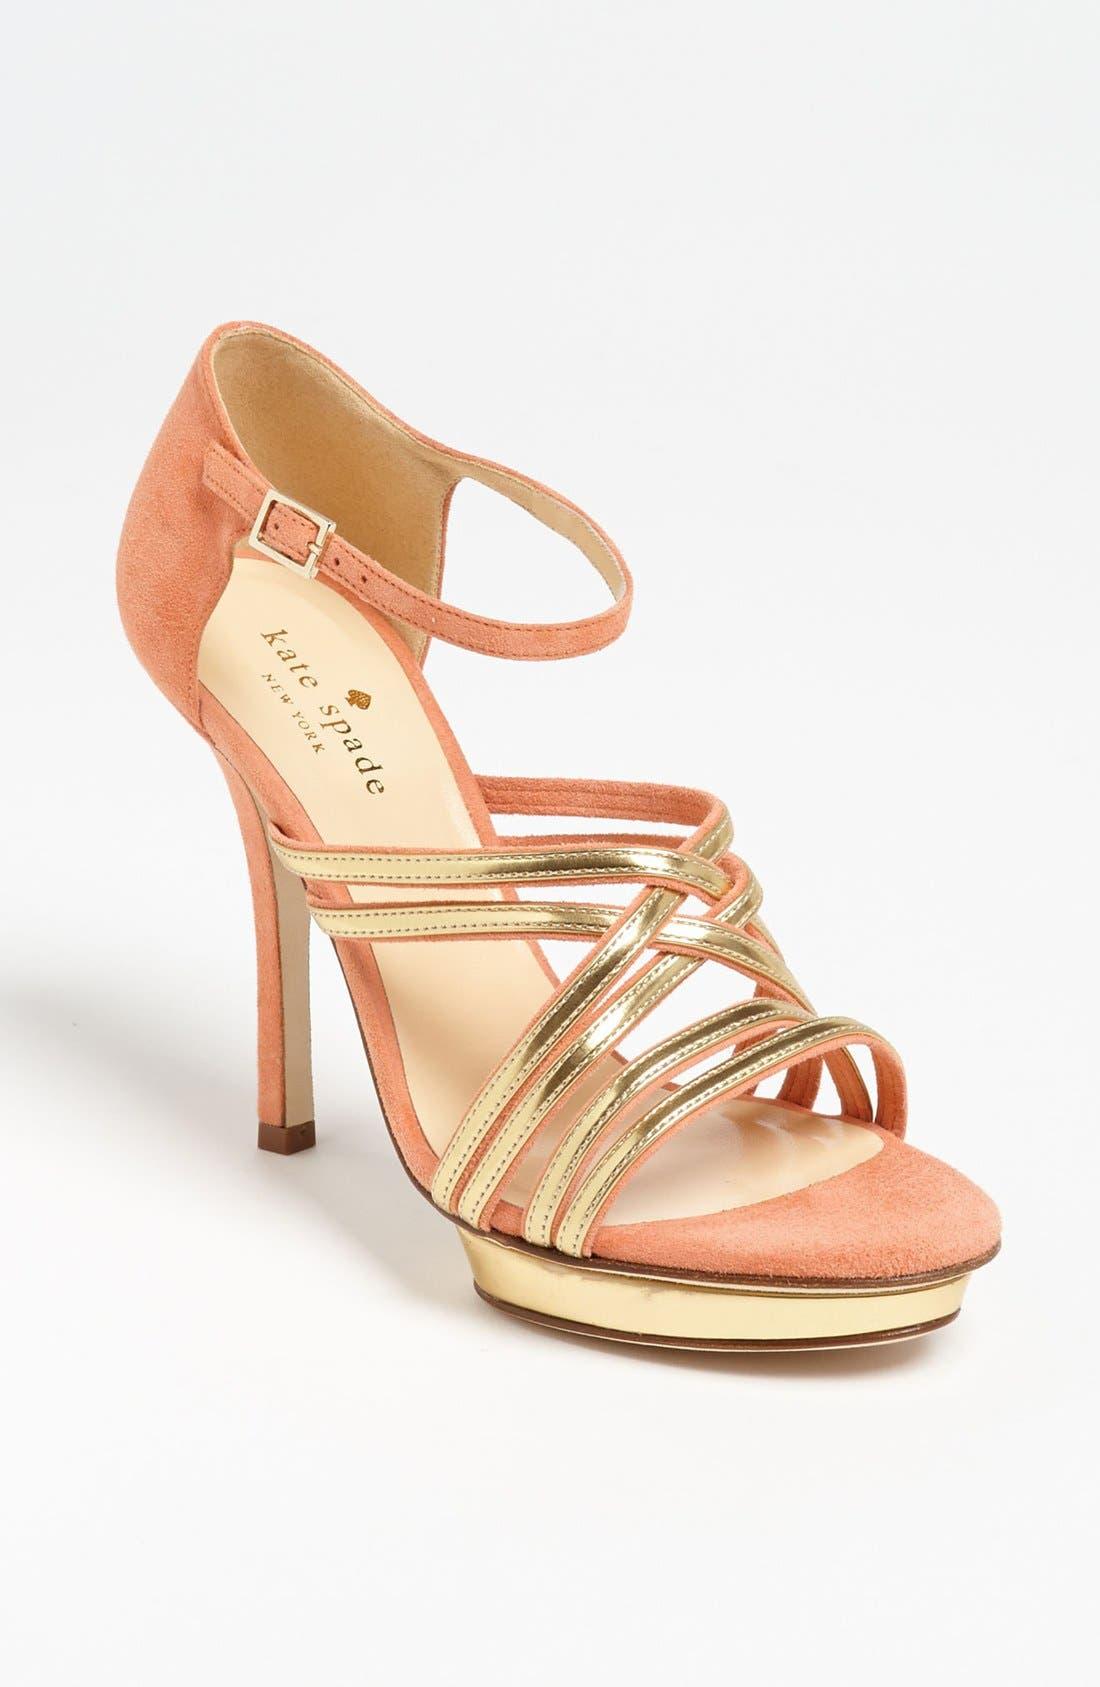 Main Image - kate spade new york 'vanity' sandal